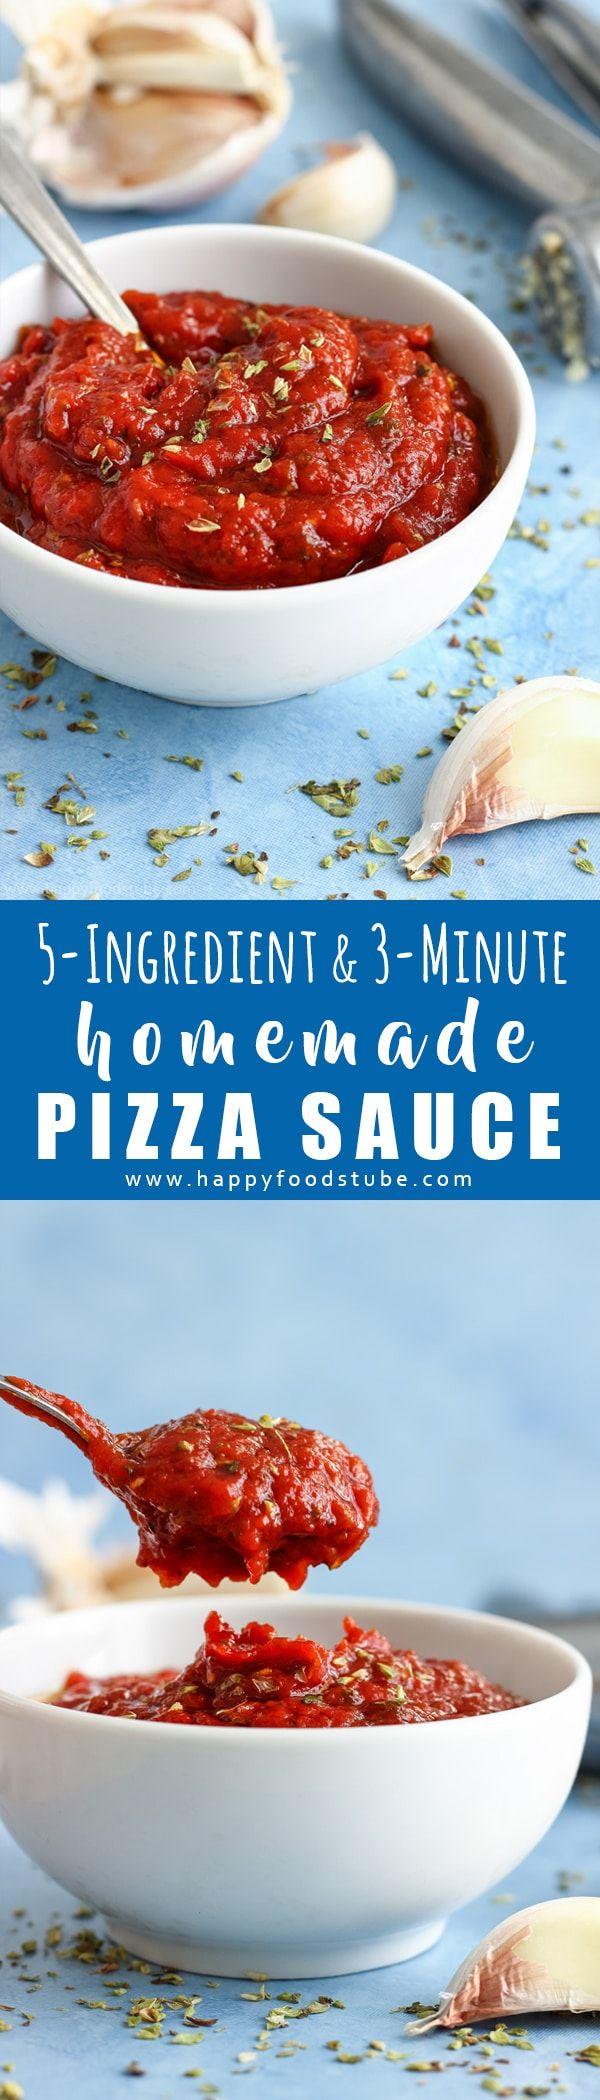 33 best Kid-Friendly Recipes images on Pinterest | Breakfast, Kid ...